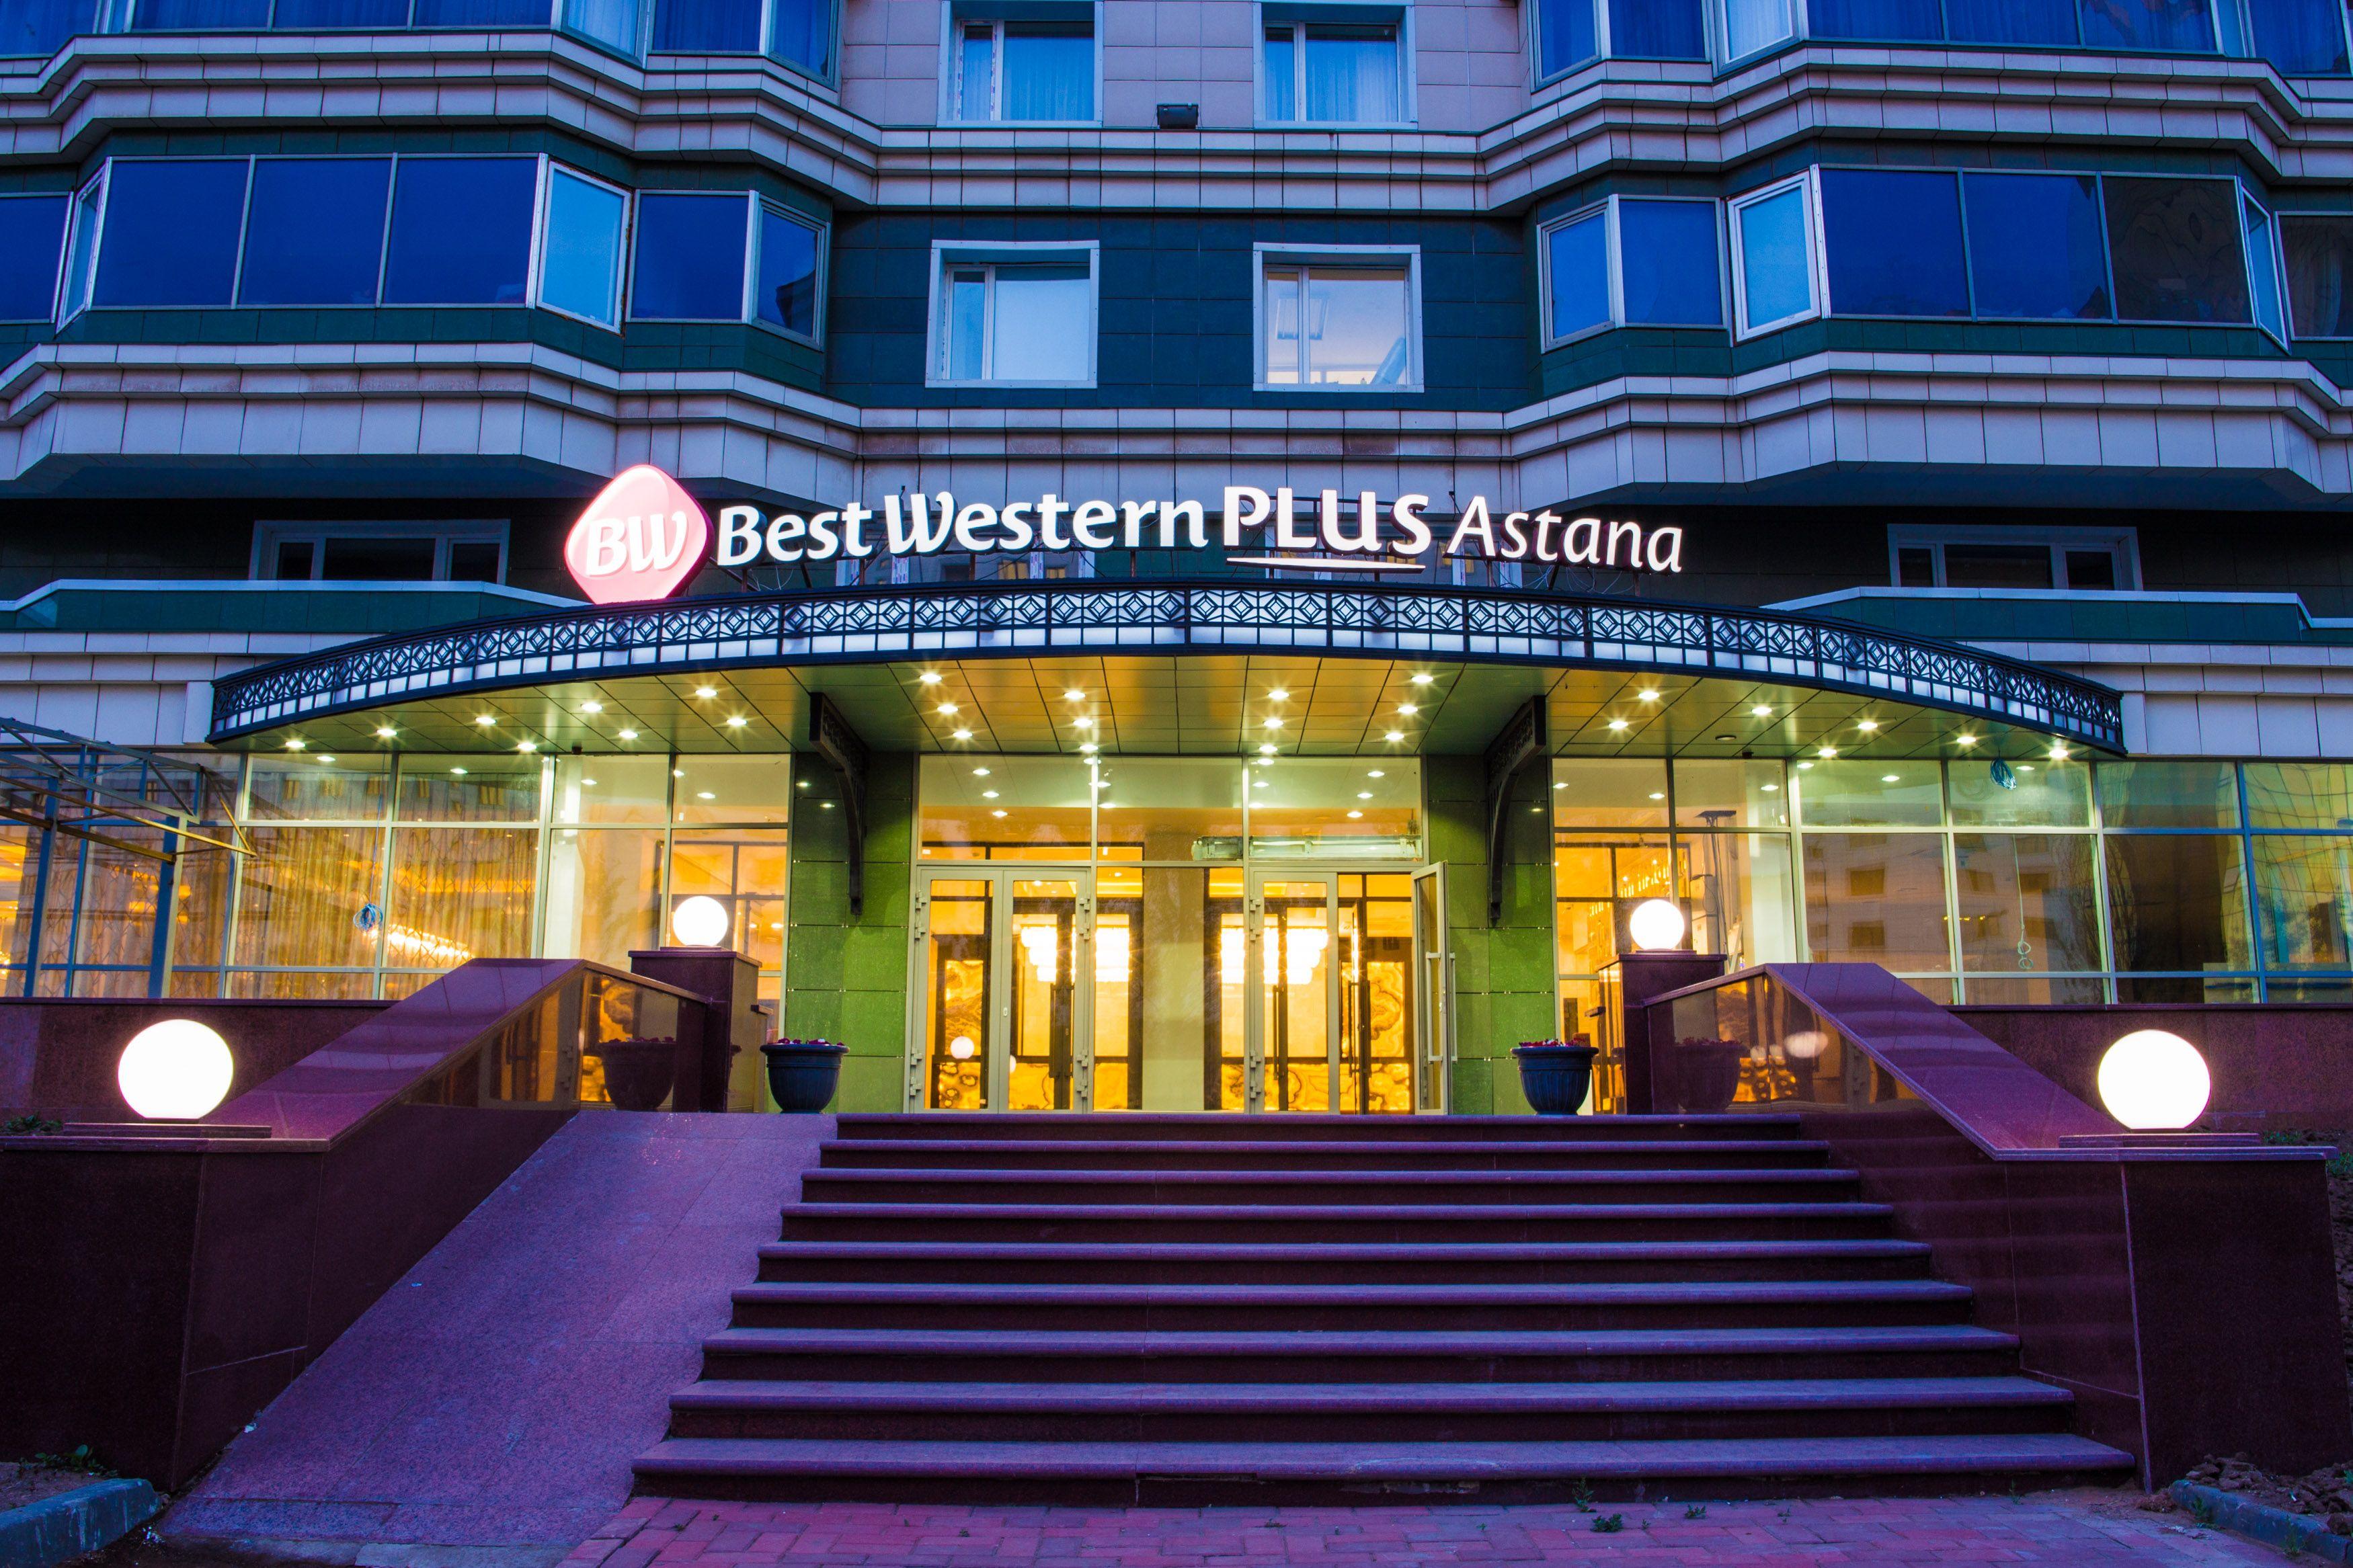 Bwplus Astana Hotel The Best Western